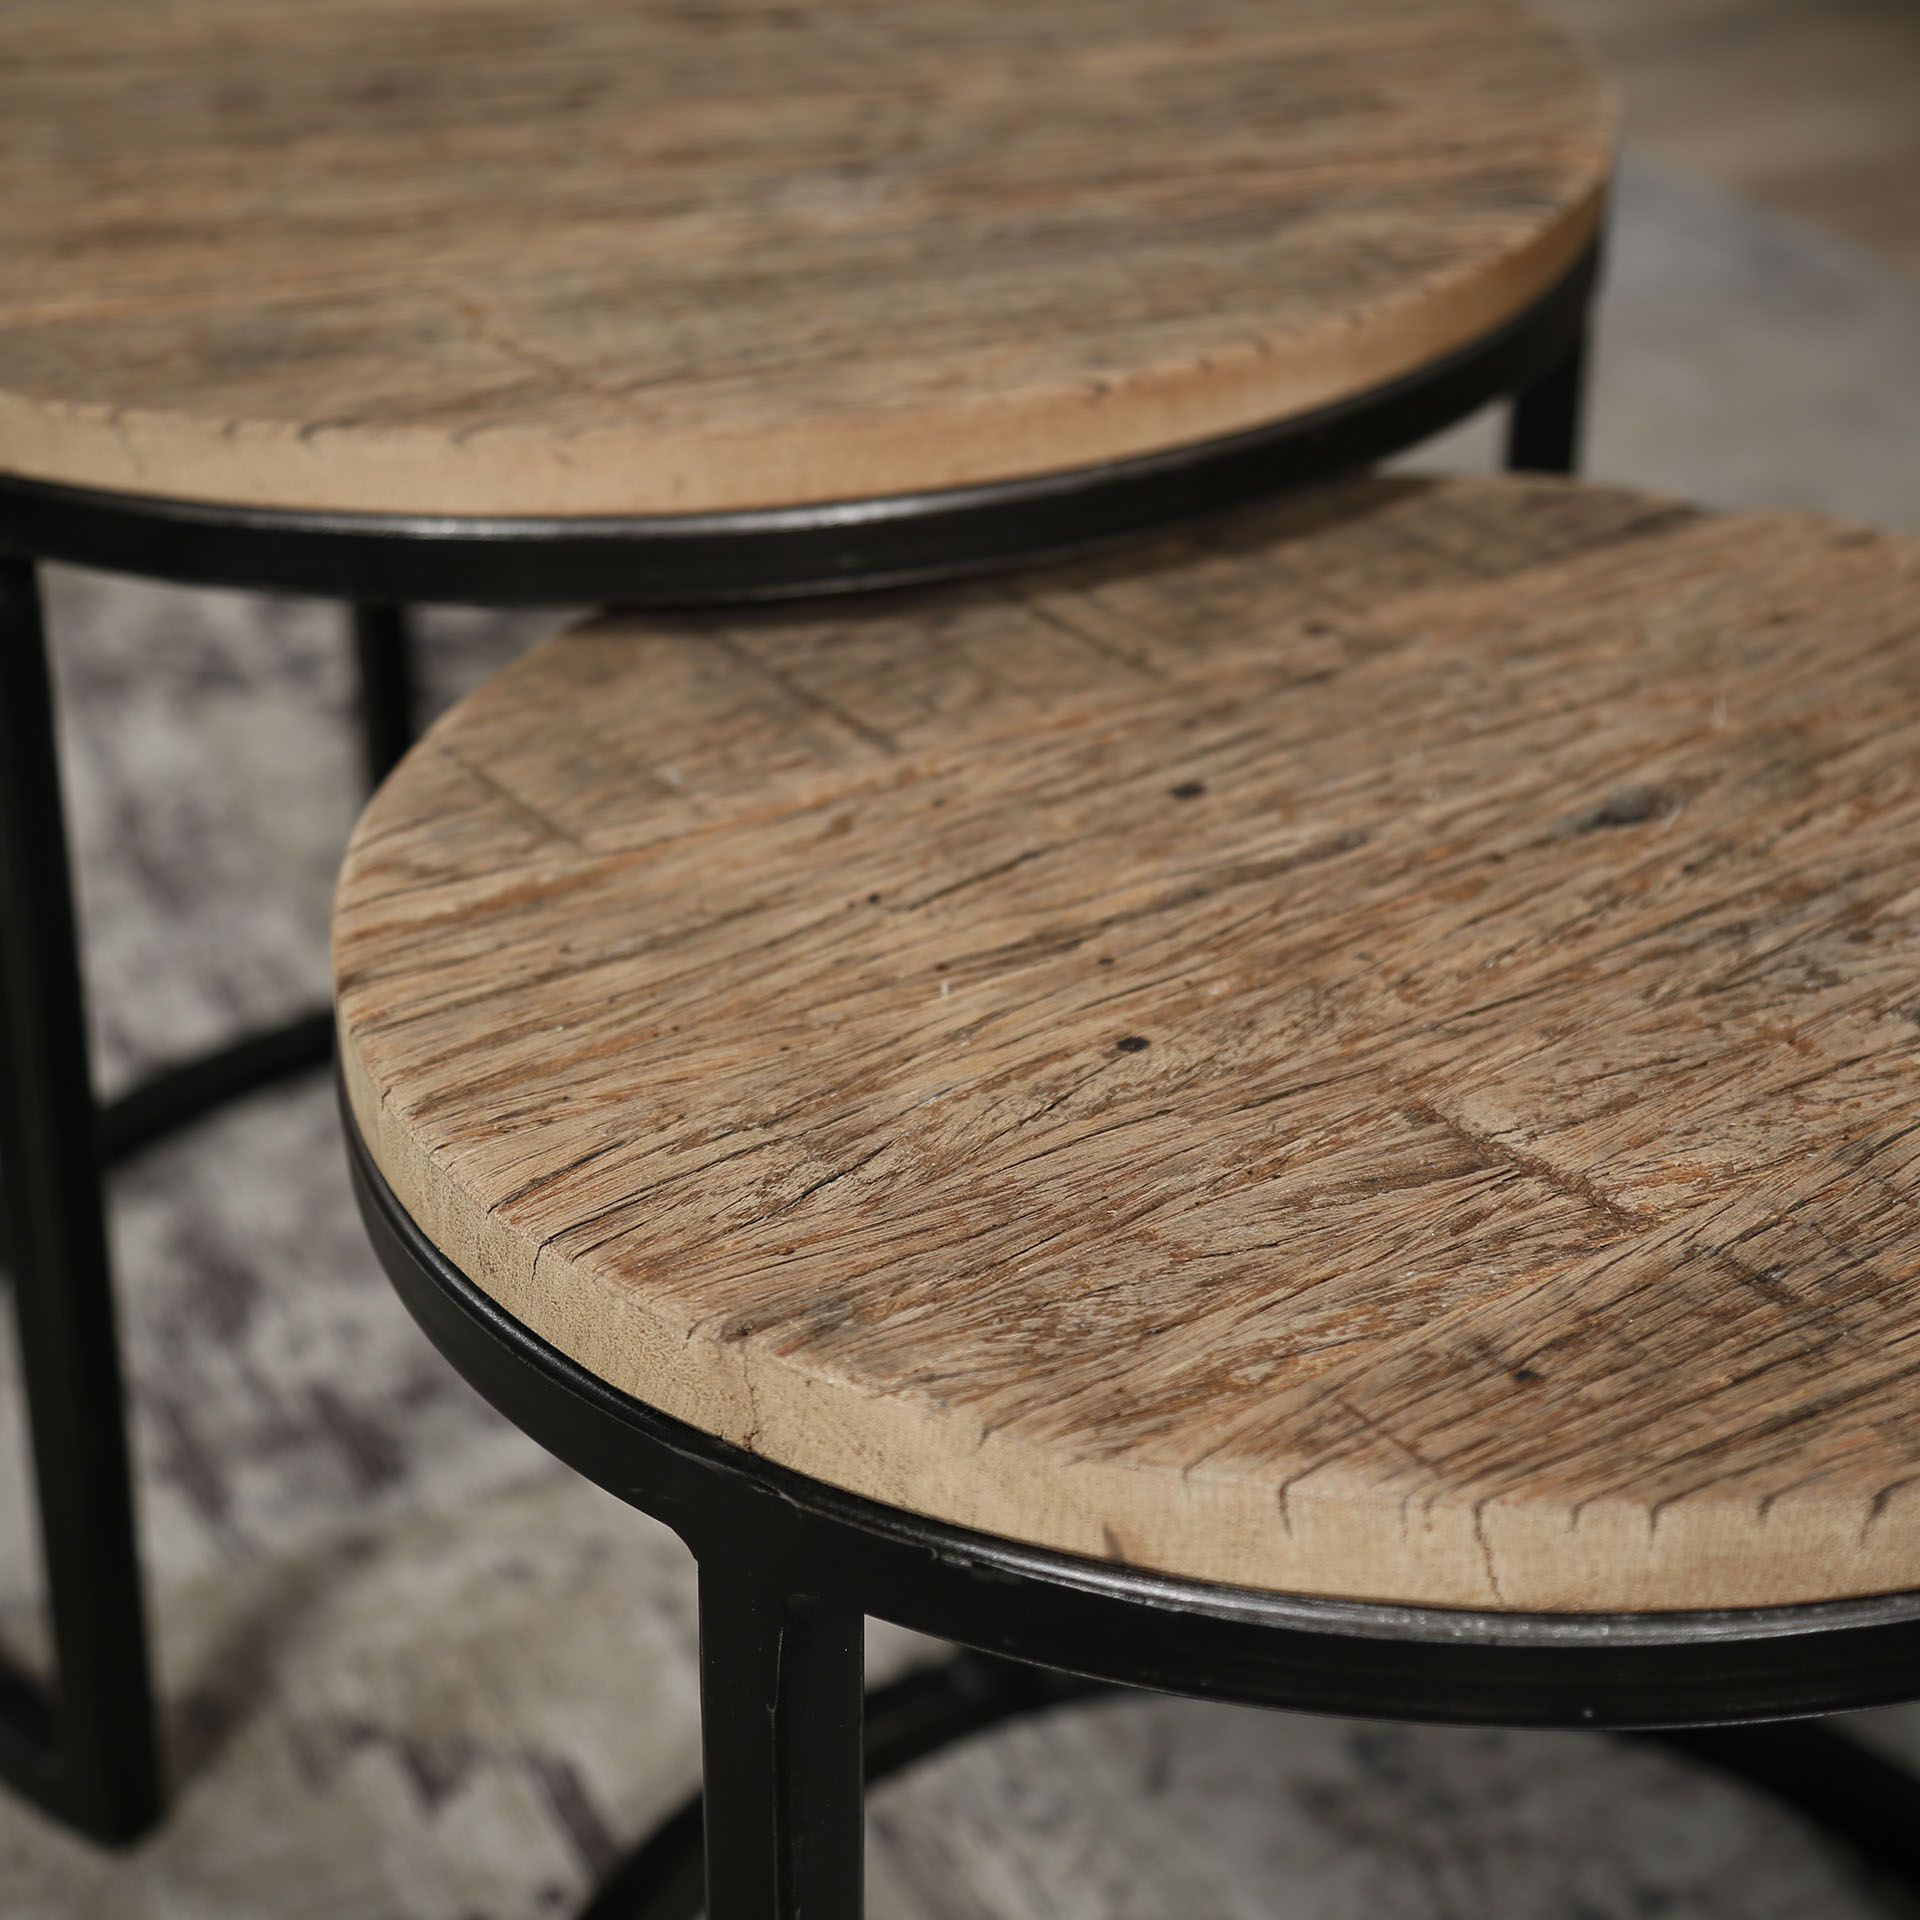 adenau-set-2-bijzettafels-robuust-hardhout-detail